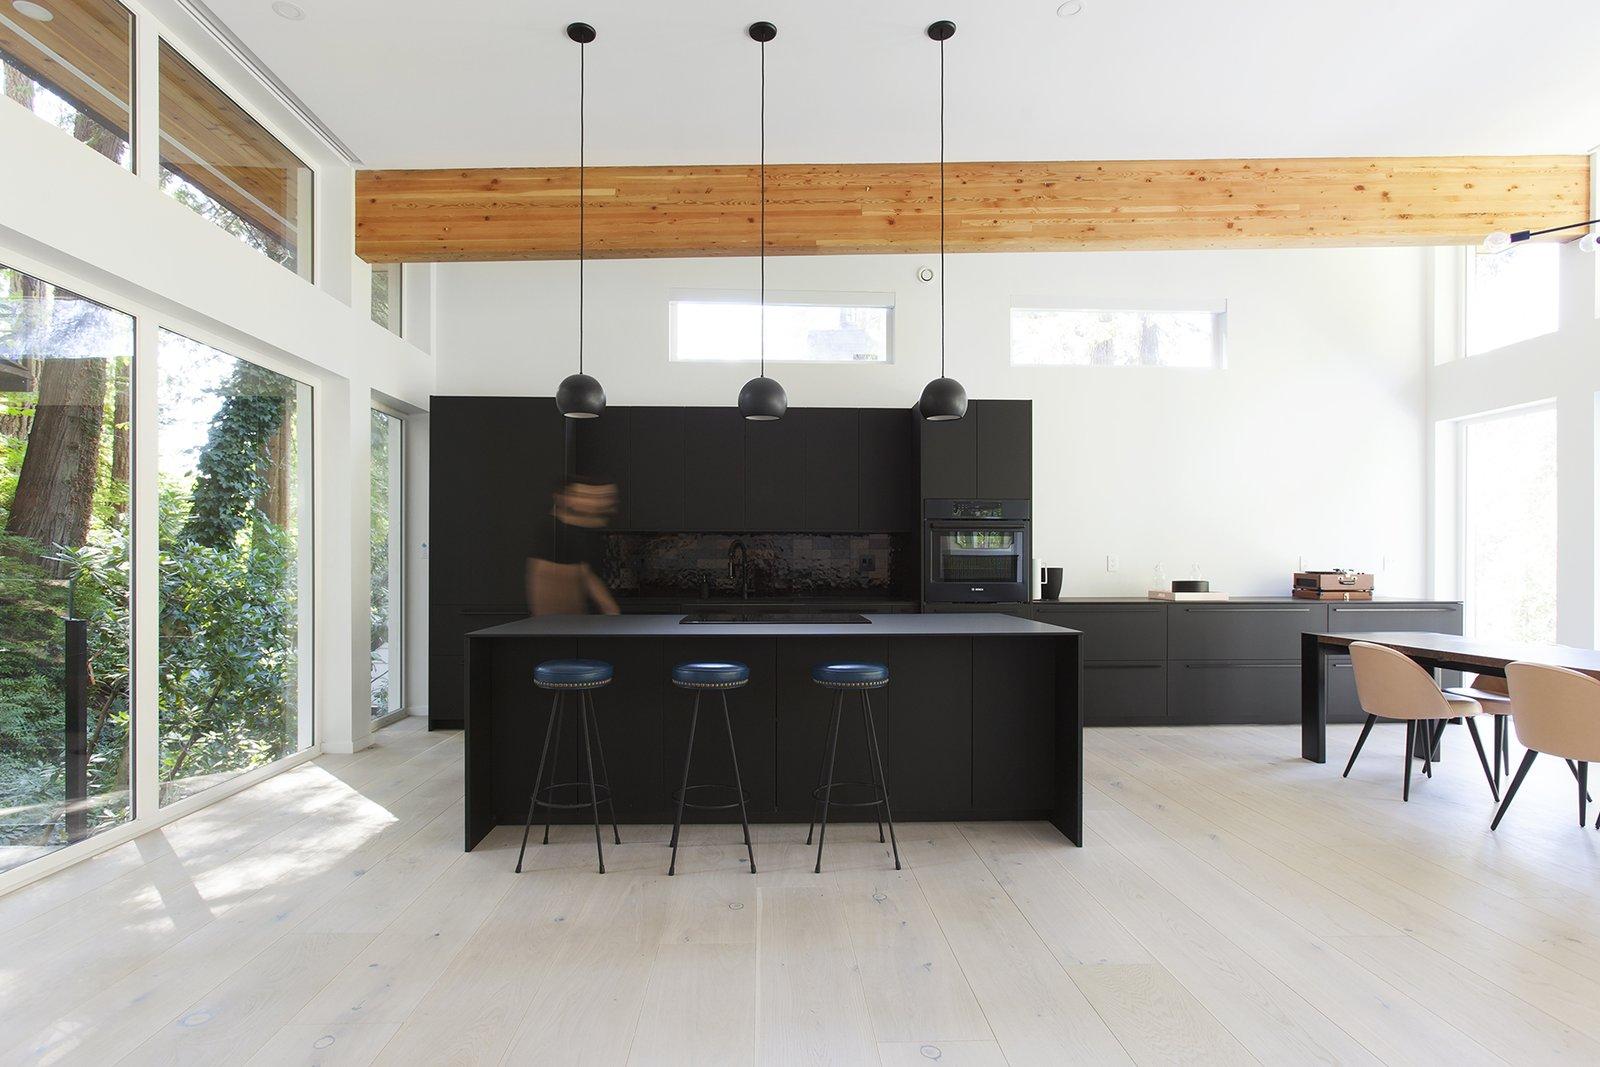 Kitchen, Pendant Lighting, Ceiling Lighting, and Light Hardwood Floor  Best Photos from Capilano House